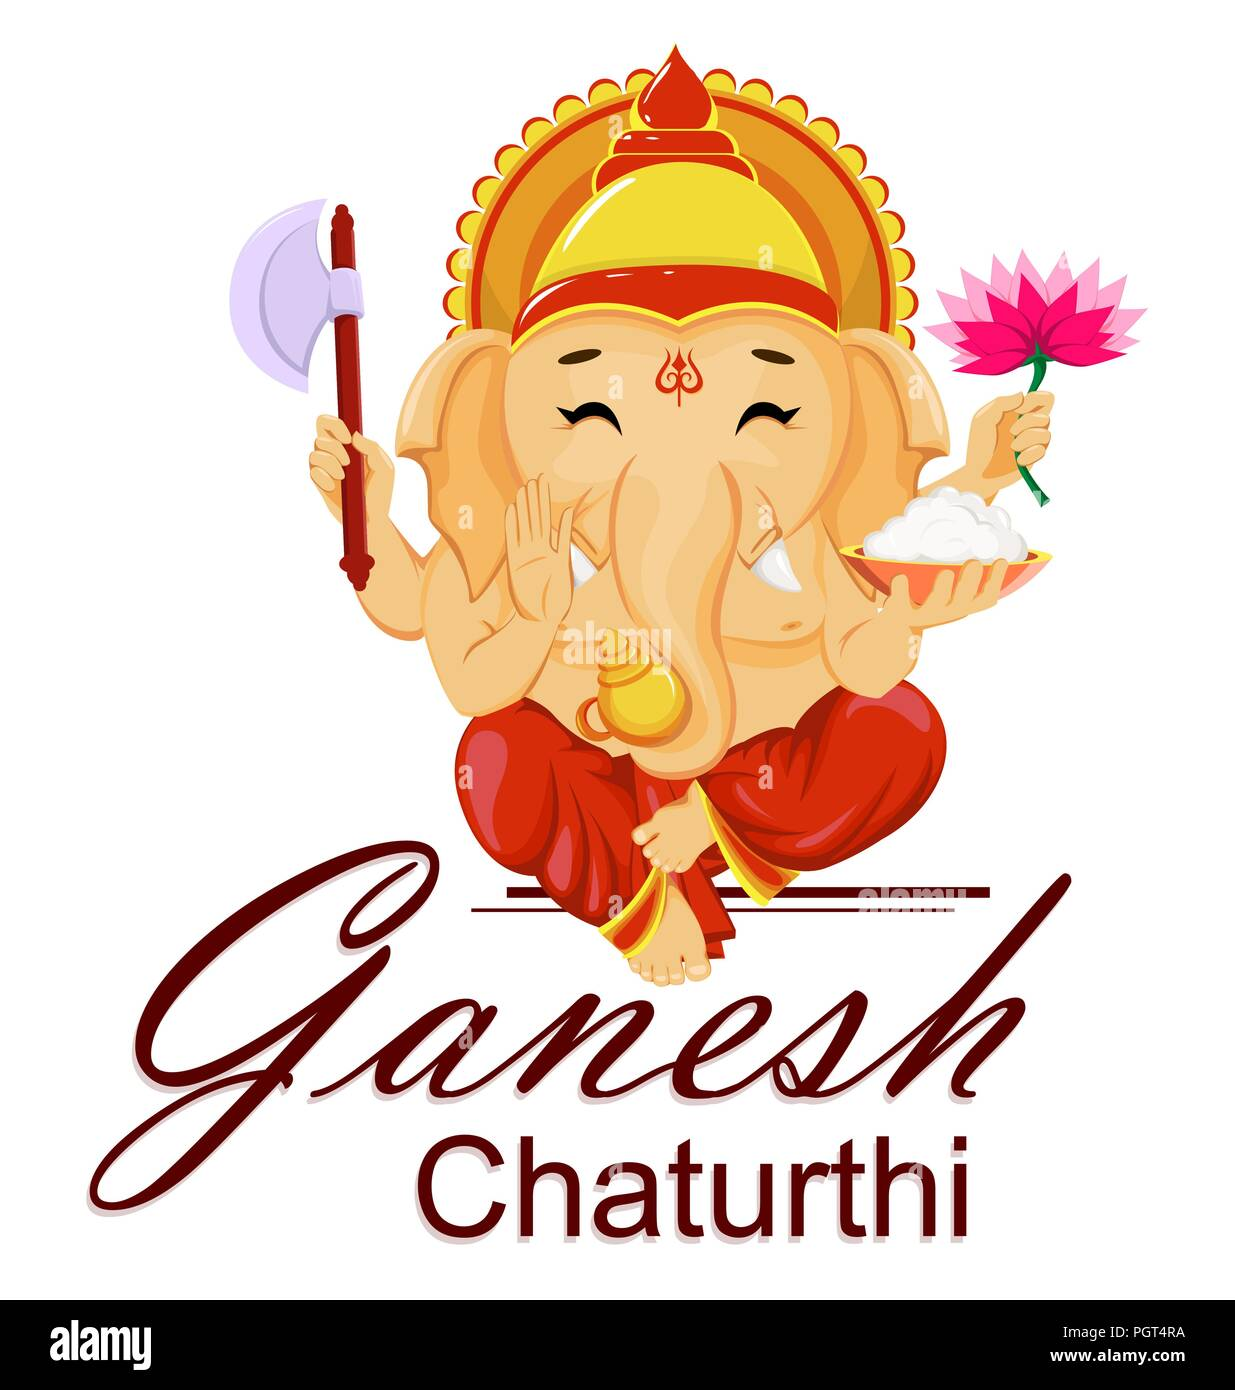 Lord Ganesha Lotus High Resolution Stock Photography And Images Alamy